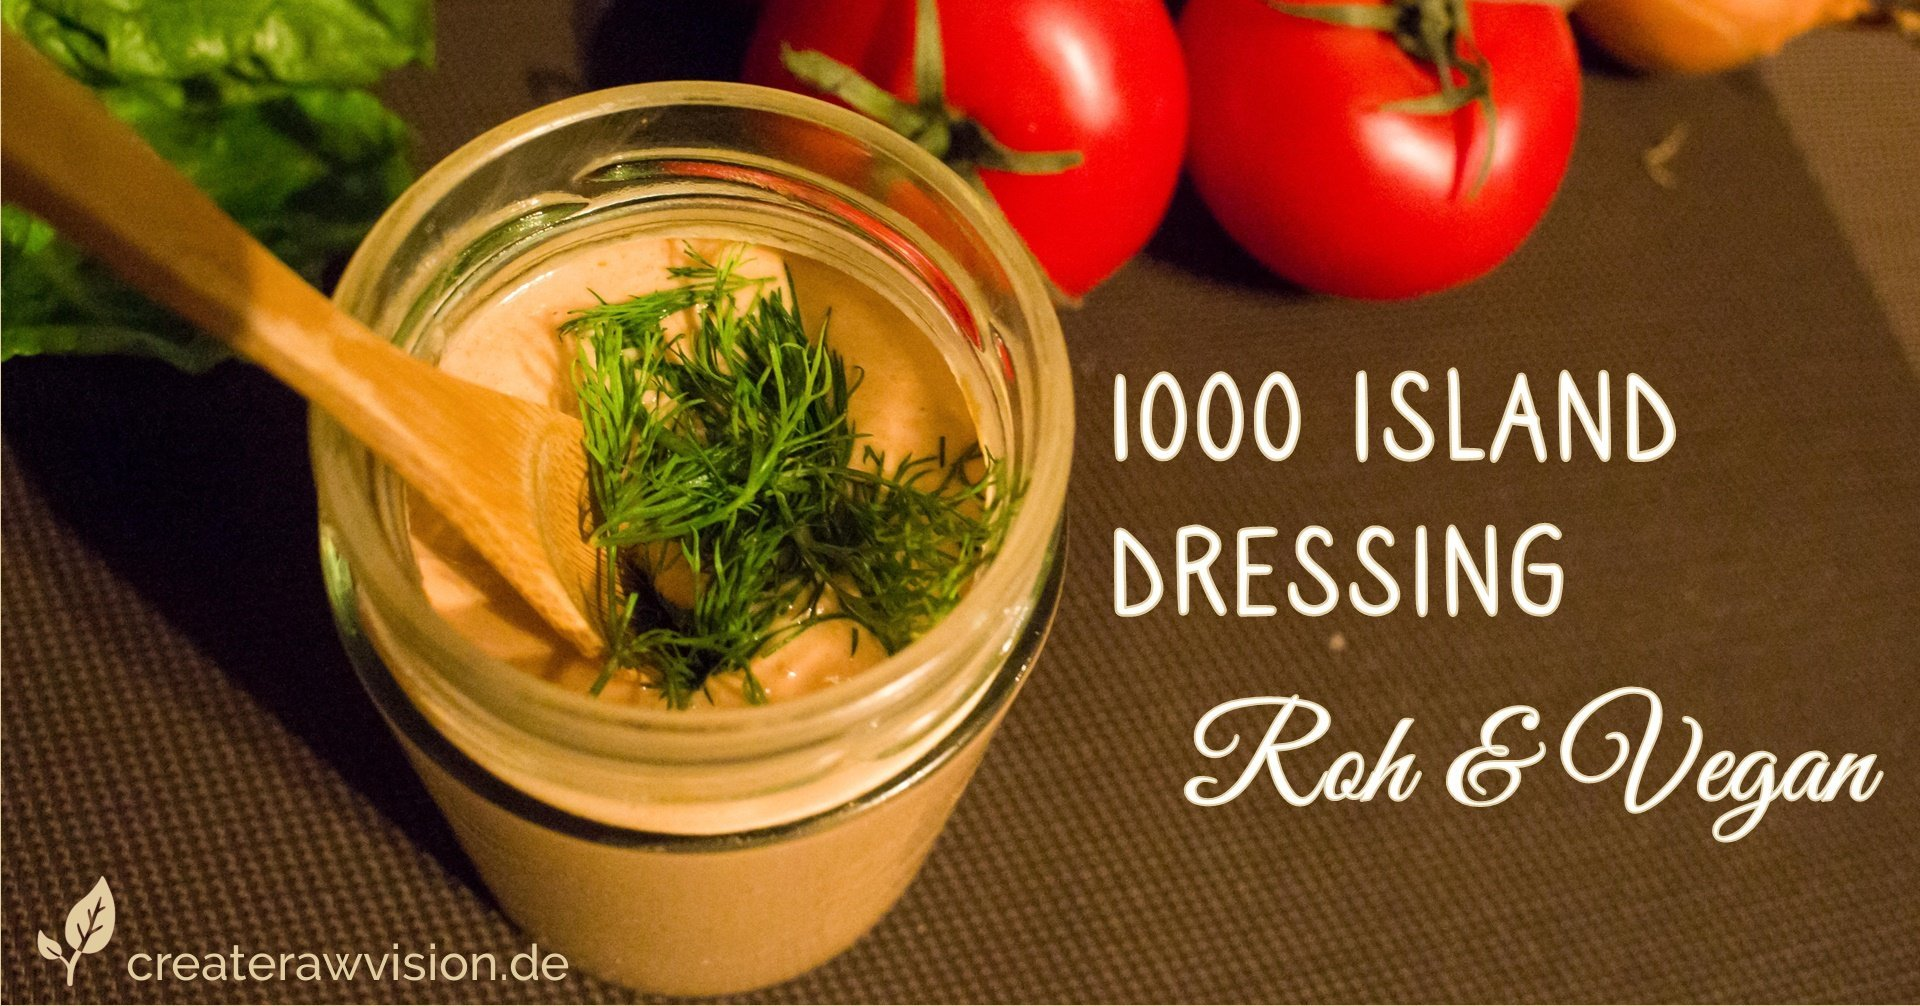 1000 Island Dressing Roh & Vegan